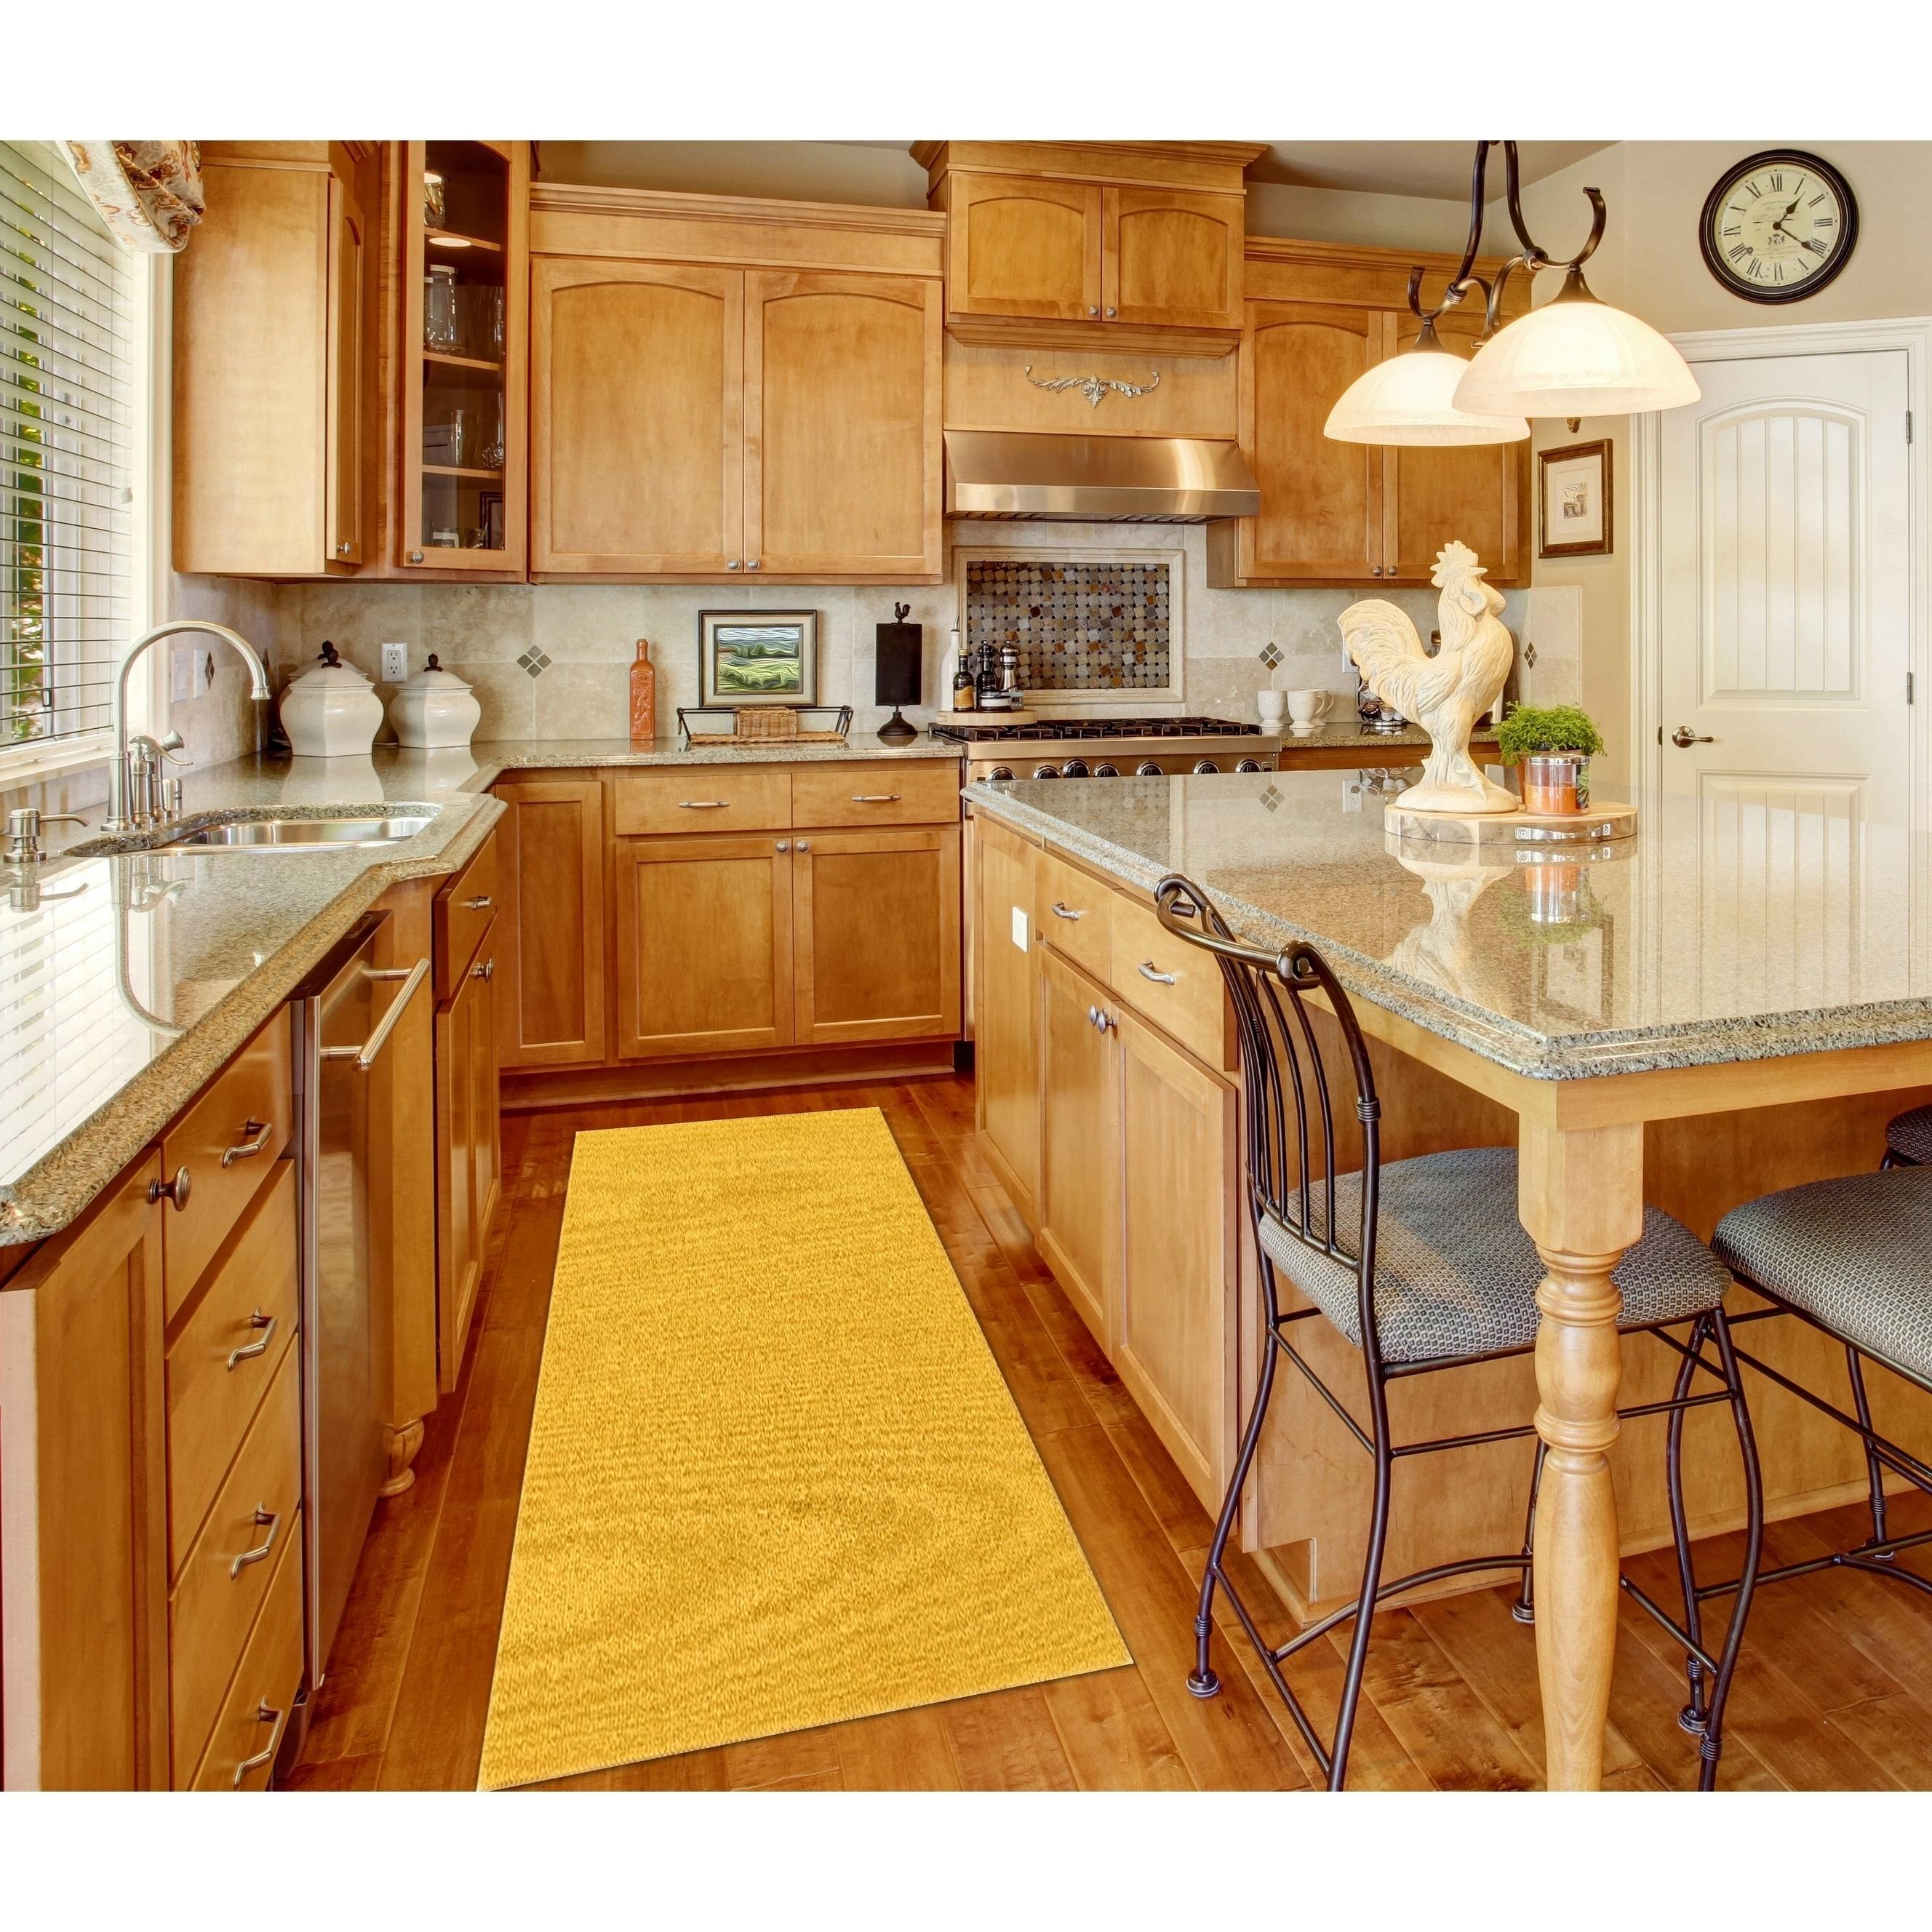 7x10 FT Extra Large Indoor Home Hallway Washable Oriental Area Runner Rug 5X7